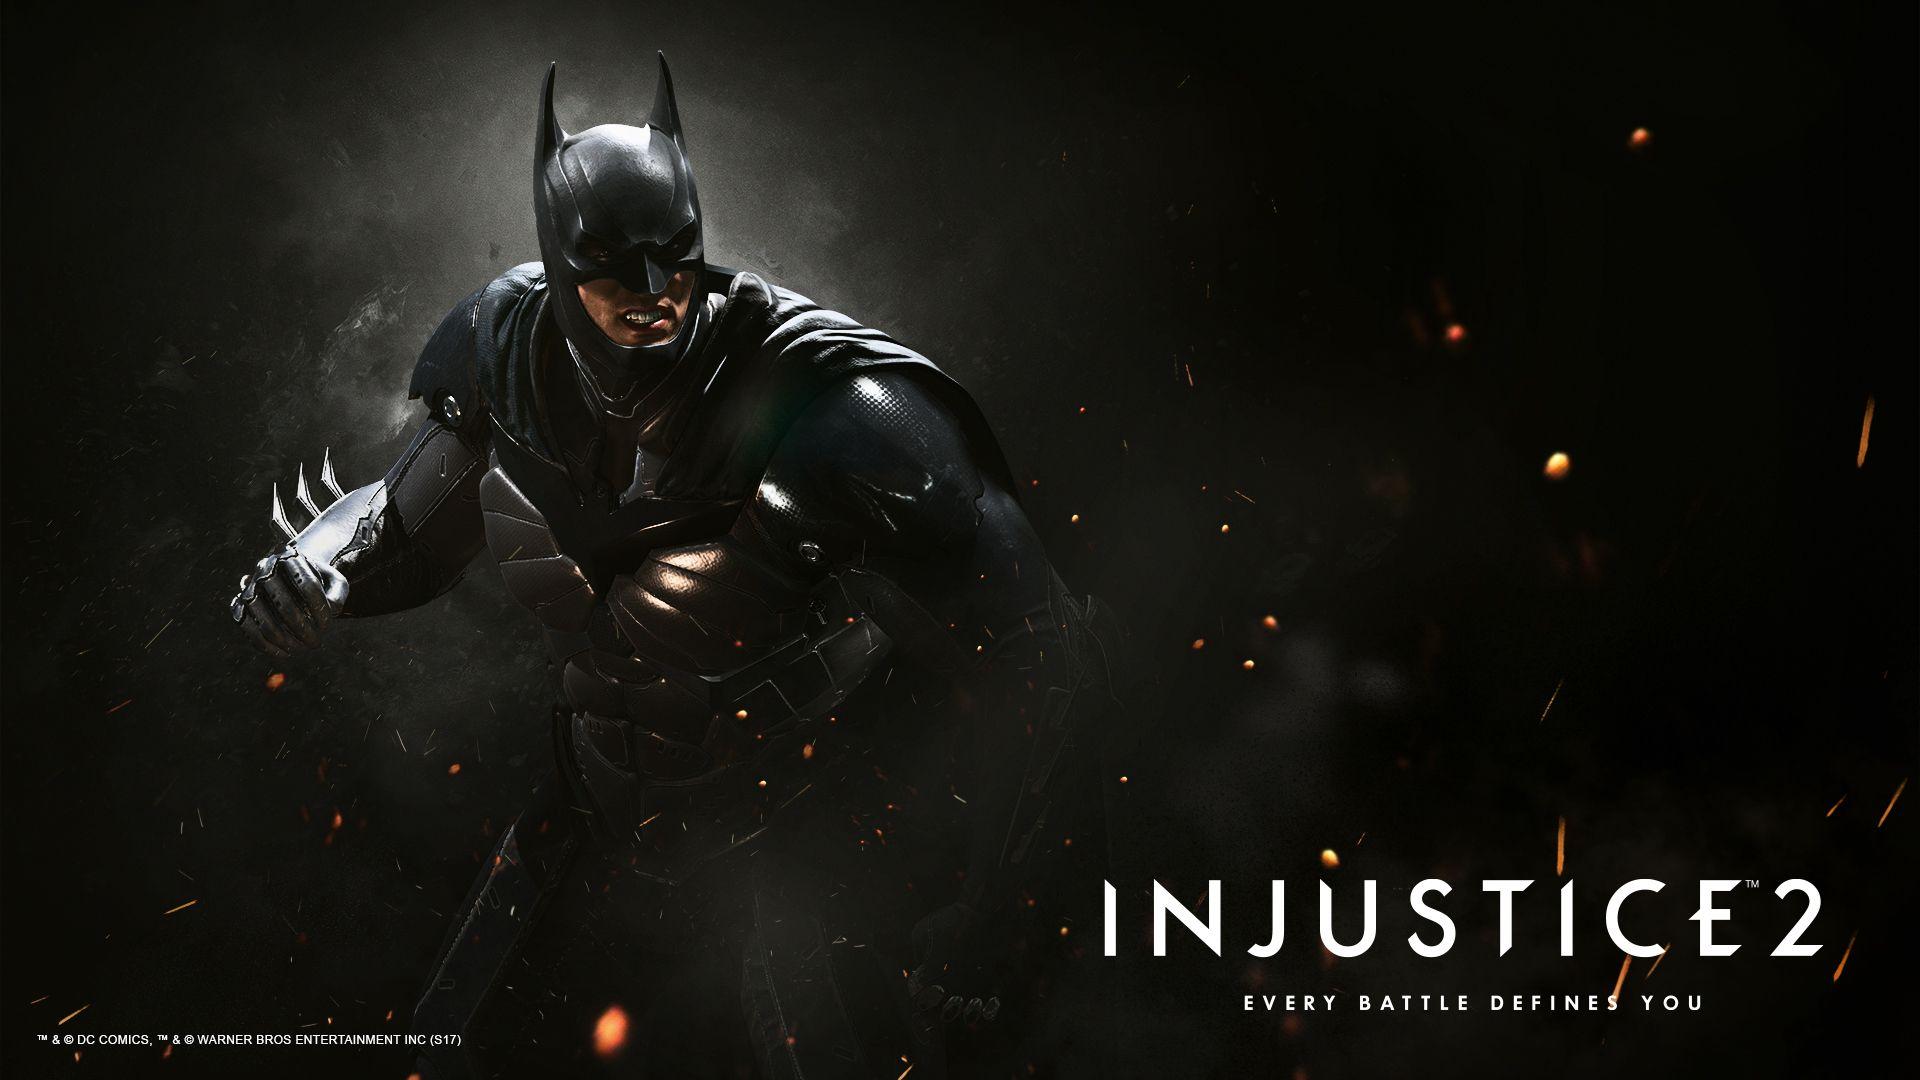 Image batman injustice 2 wallpaper 0001g dc database fandom batman injustice 2 wallpaper 0001g voltagebd Choice Image